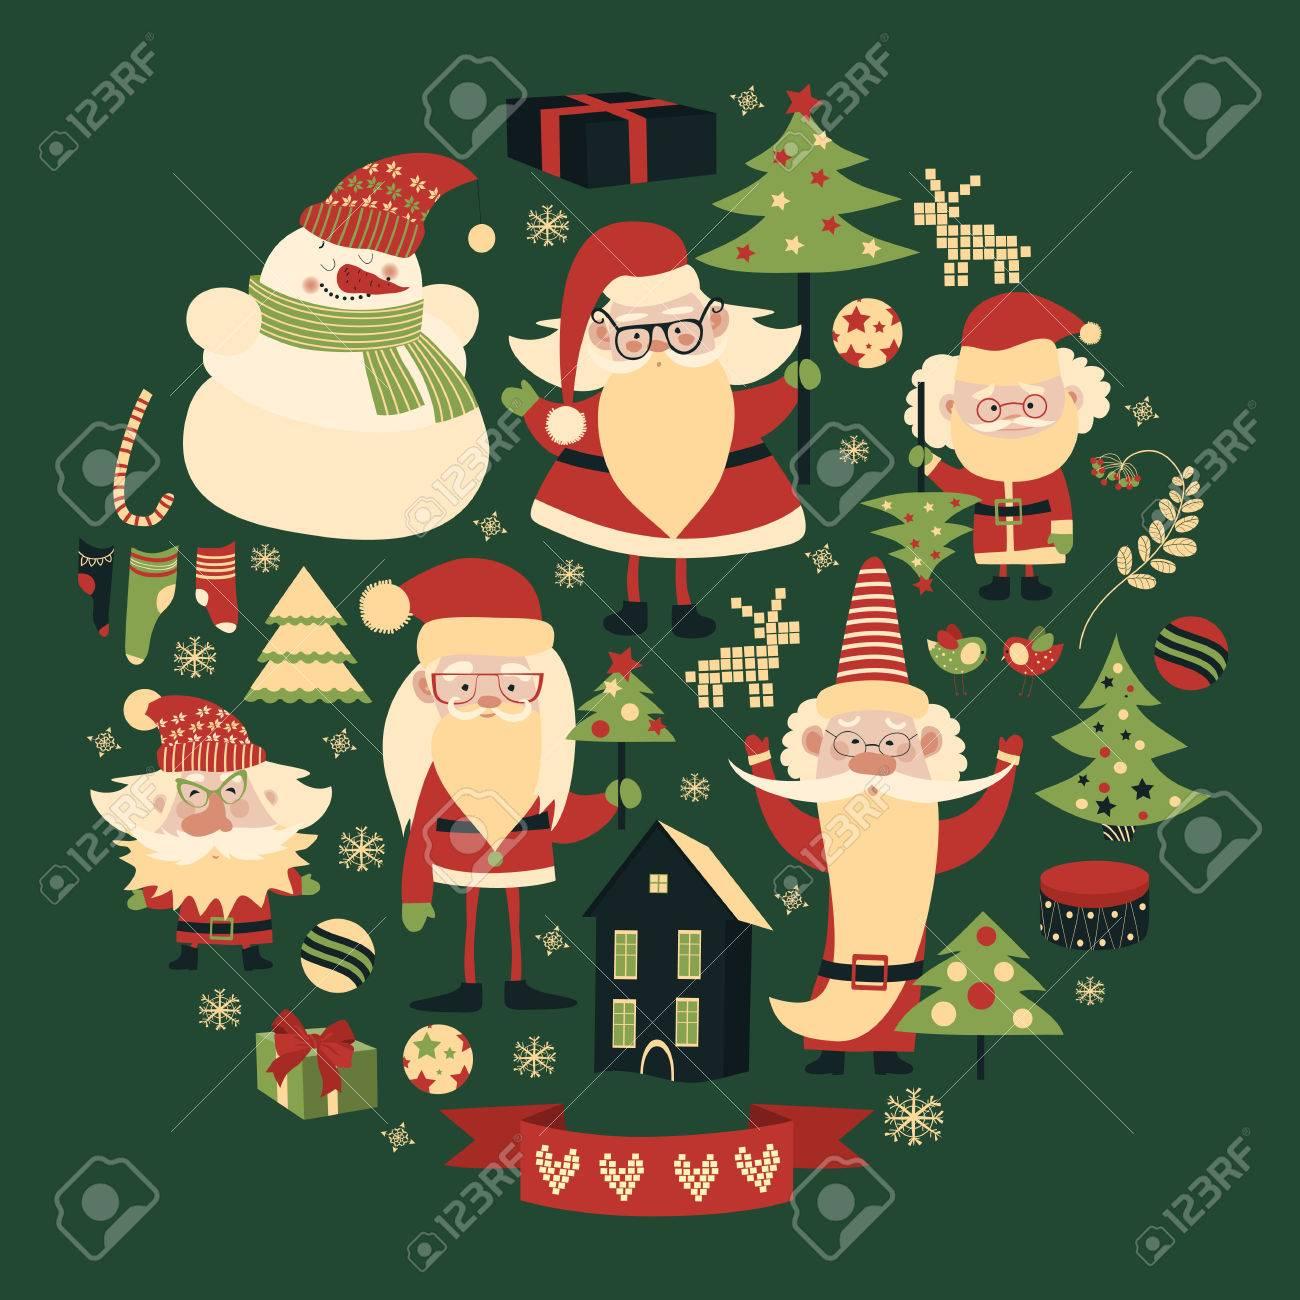 Vector collection of christmas items. Santa Claus, Christmas tree,snowman - 48417955